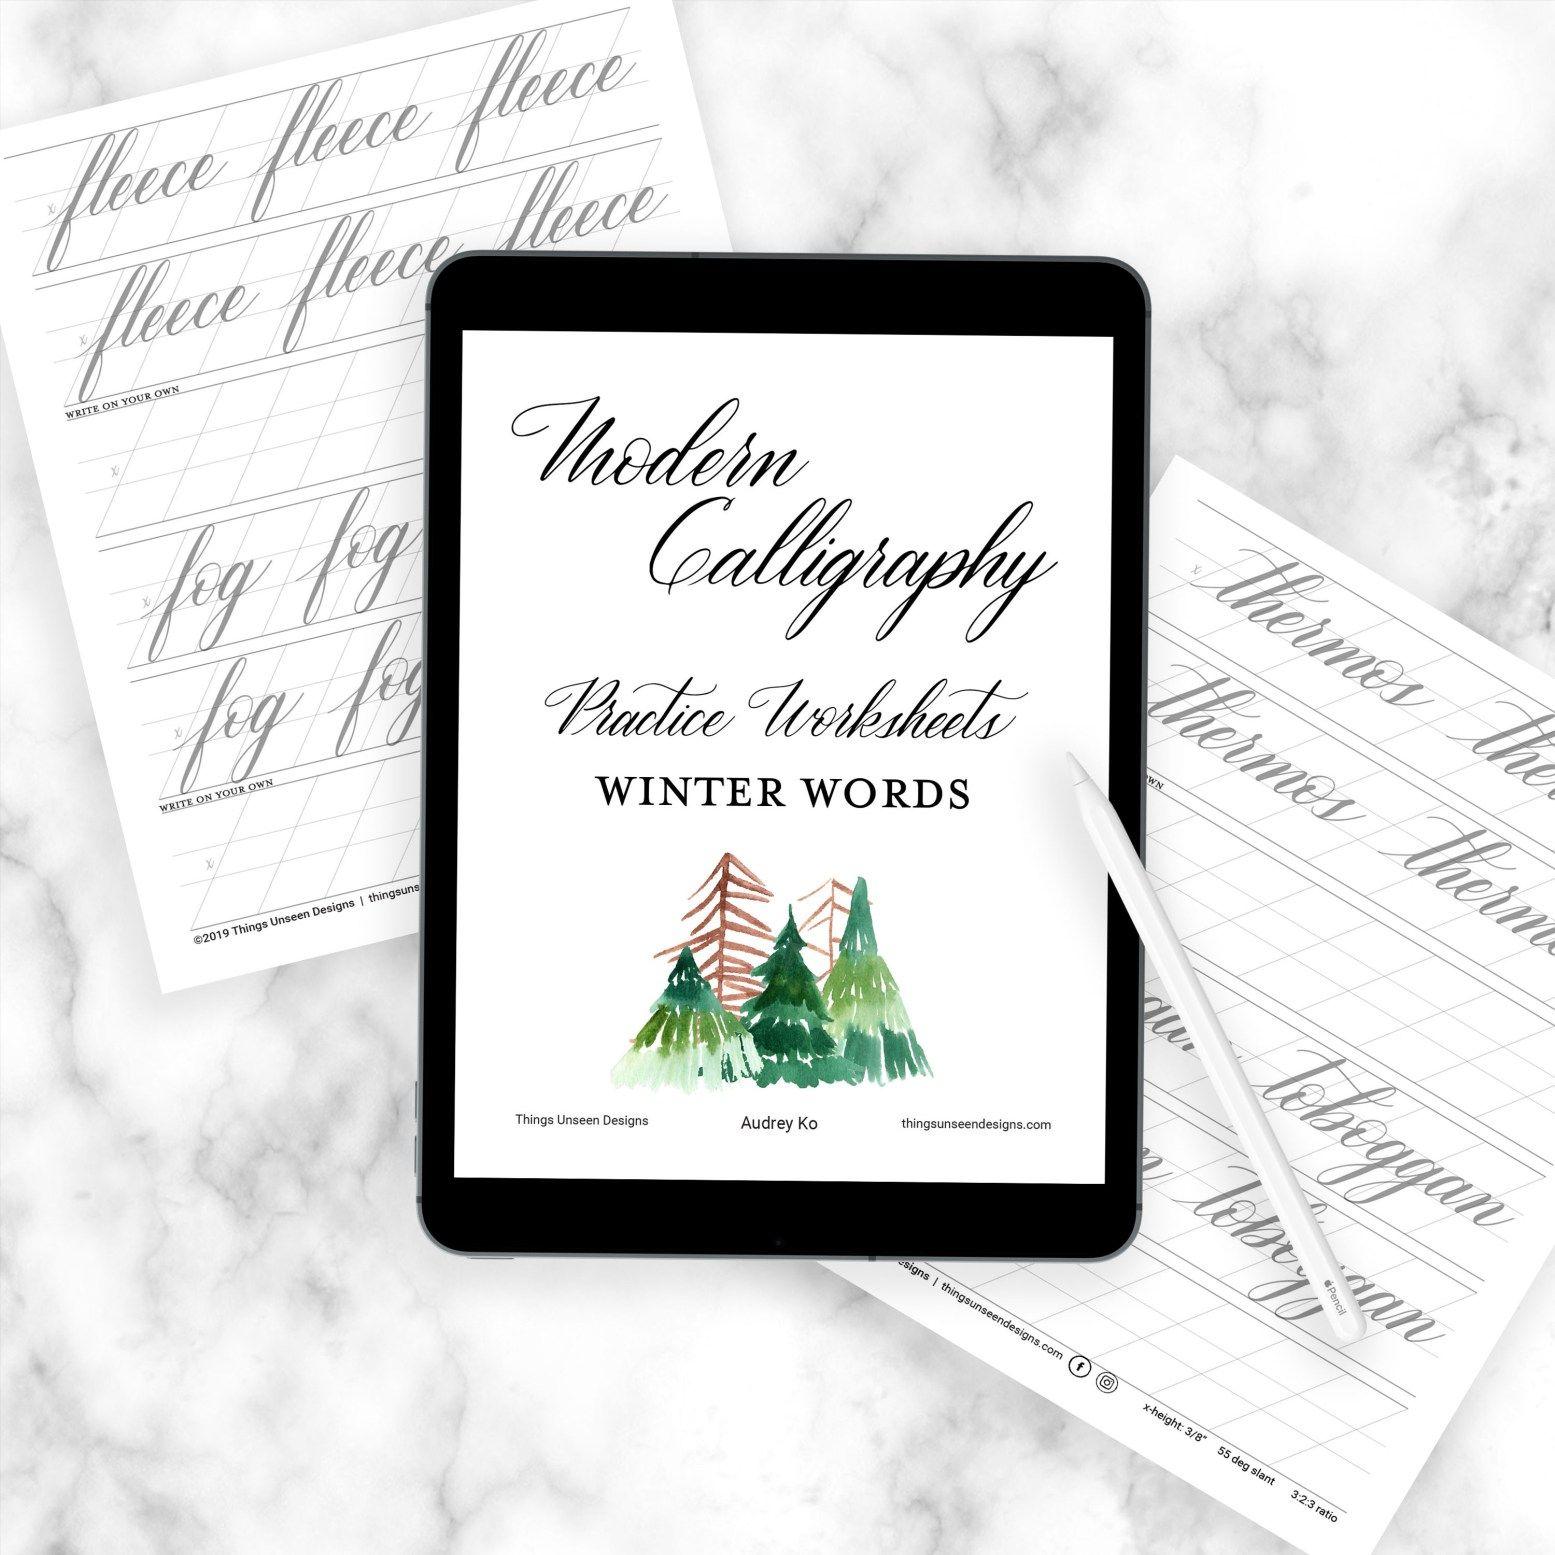 Modern Calligraphy Worksheets Winter Words